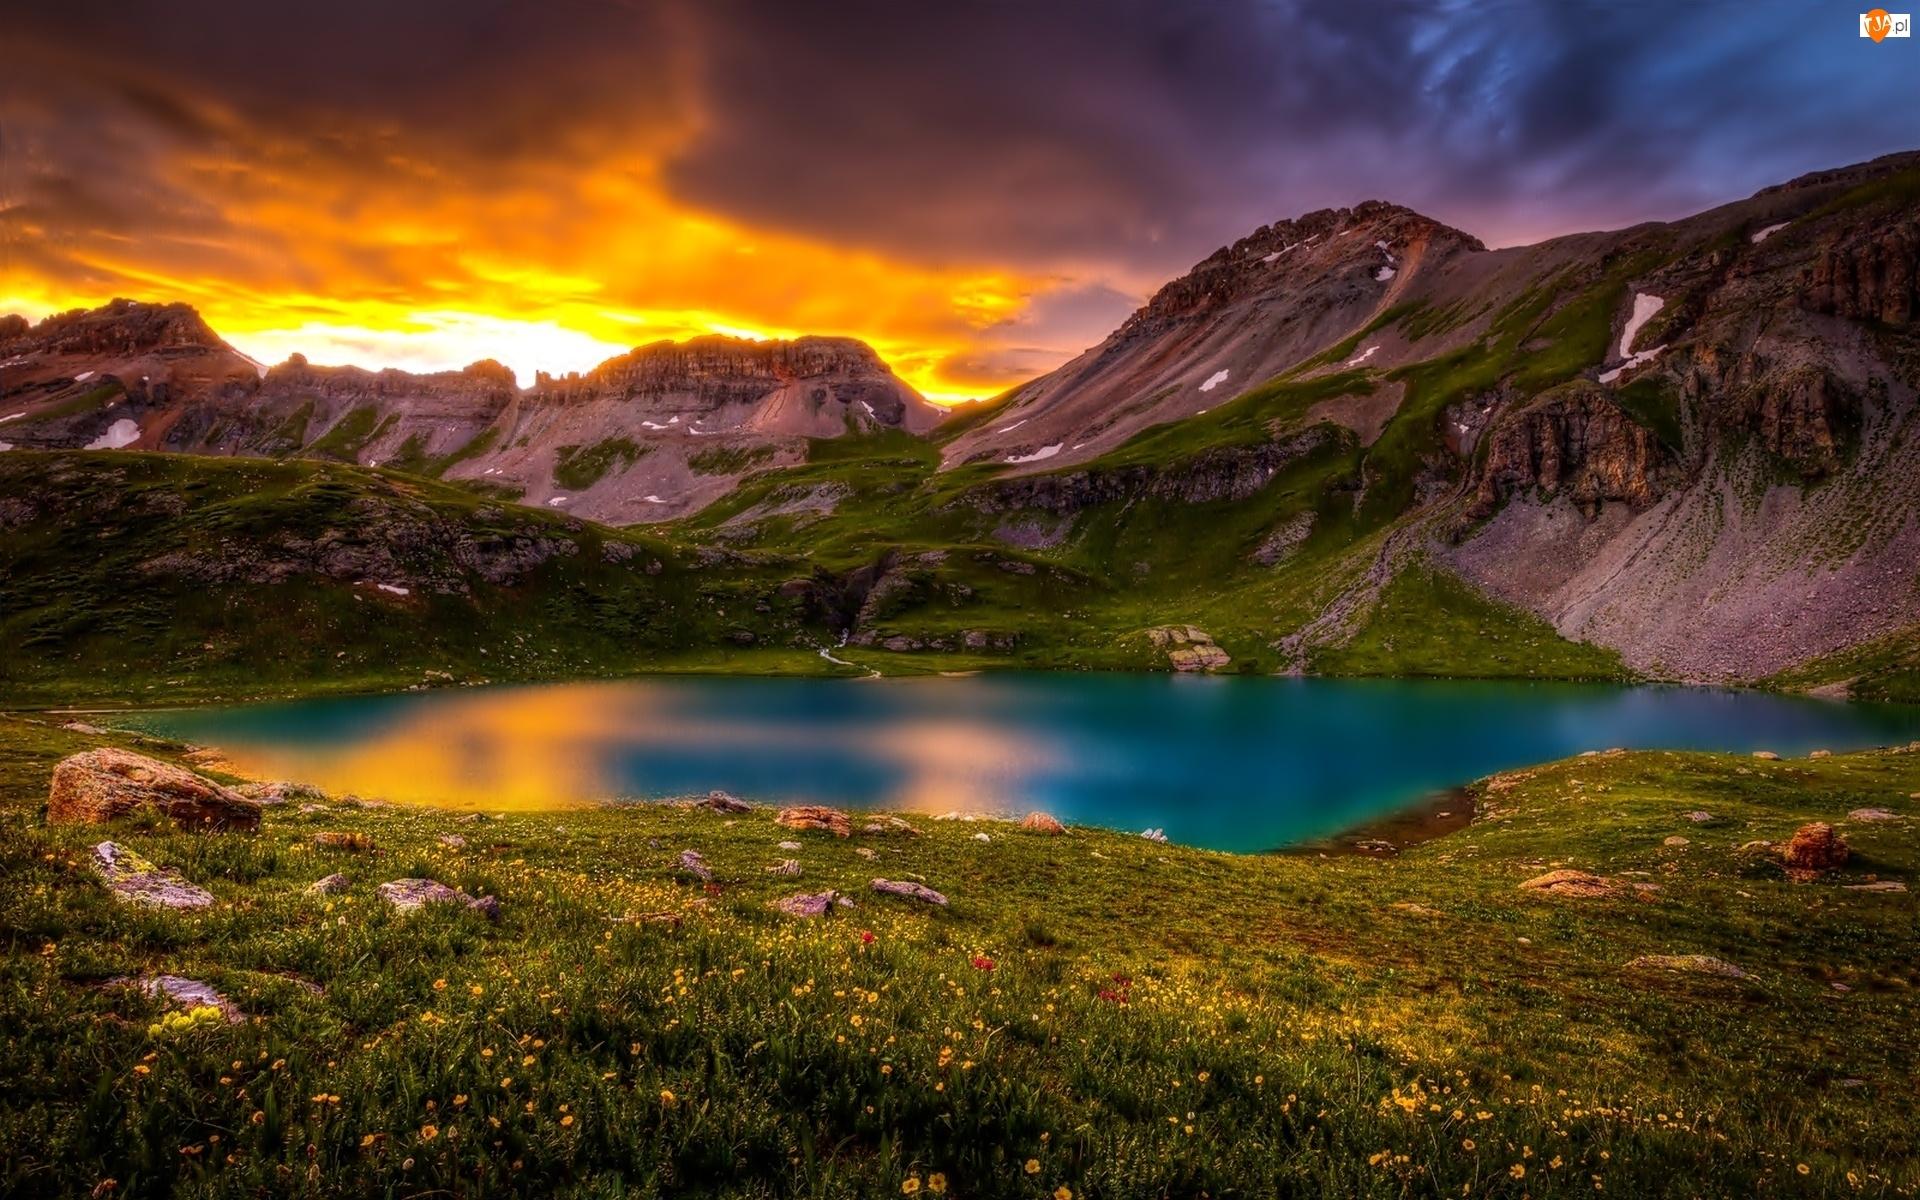 Zachód, Jezioro, Słońca, Góry